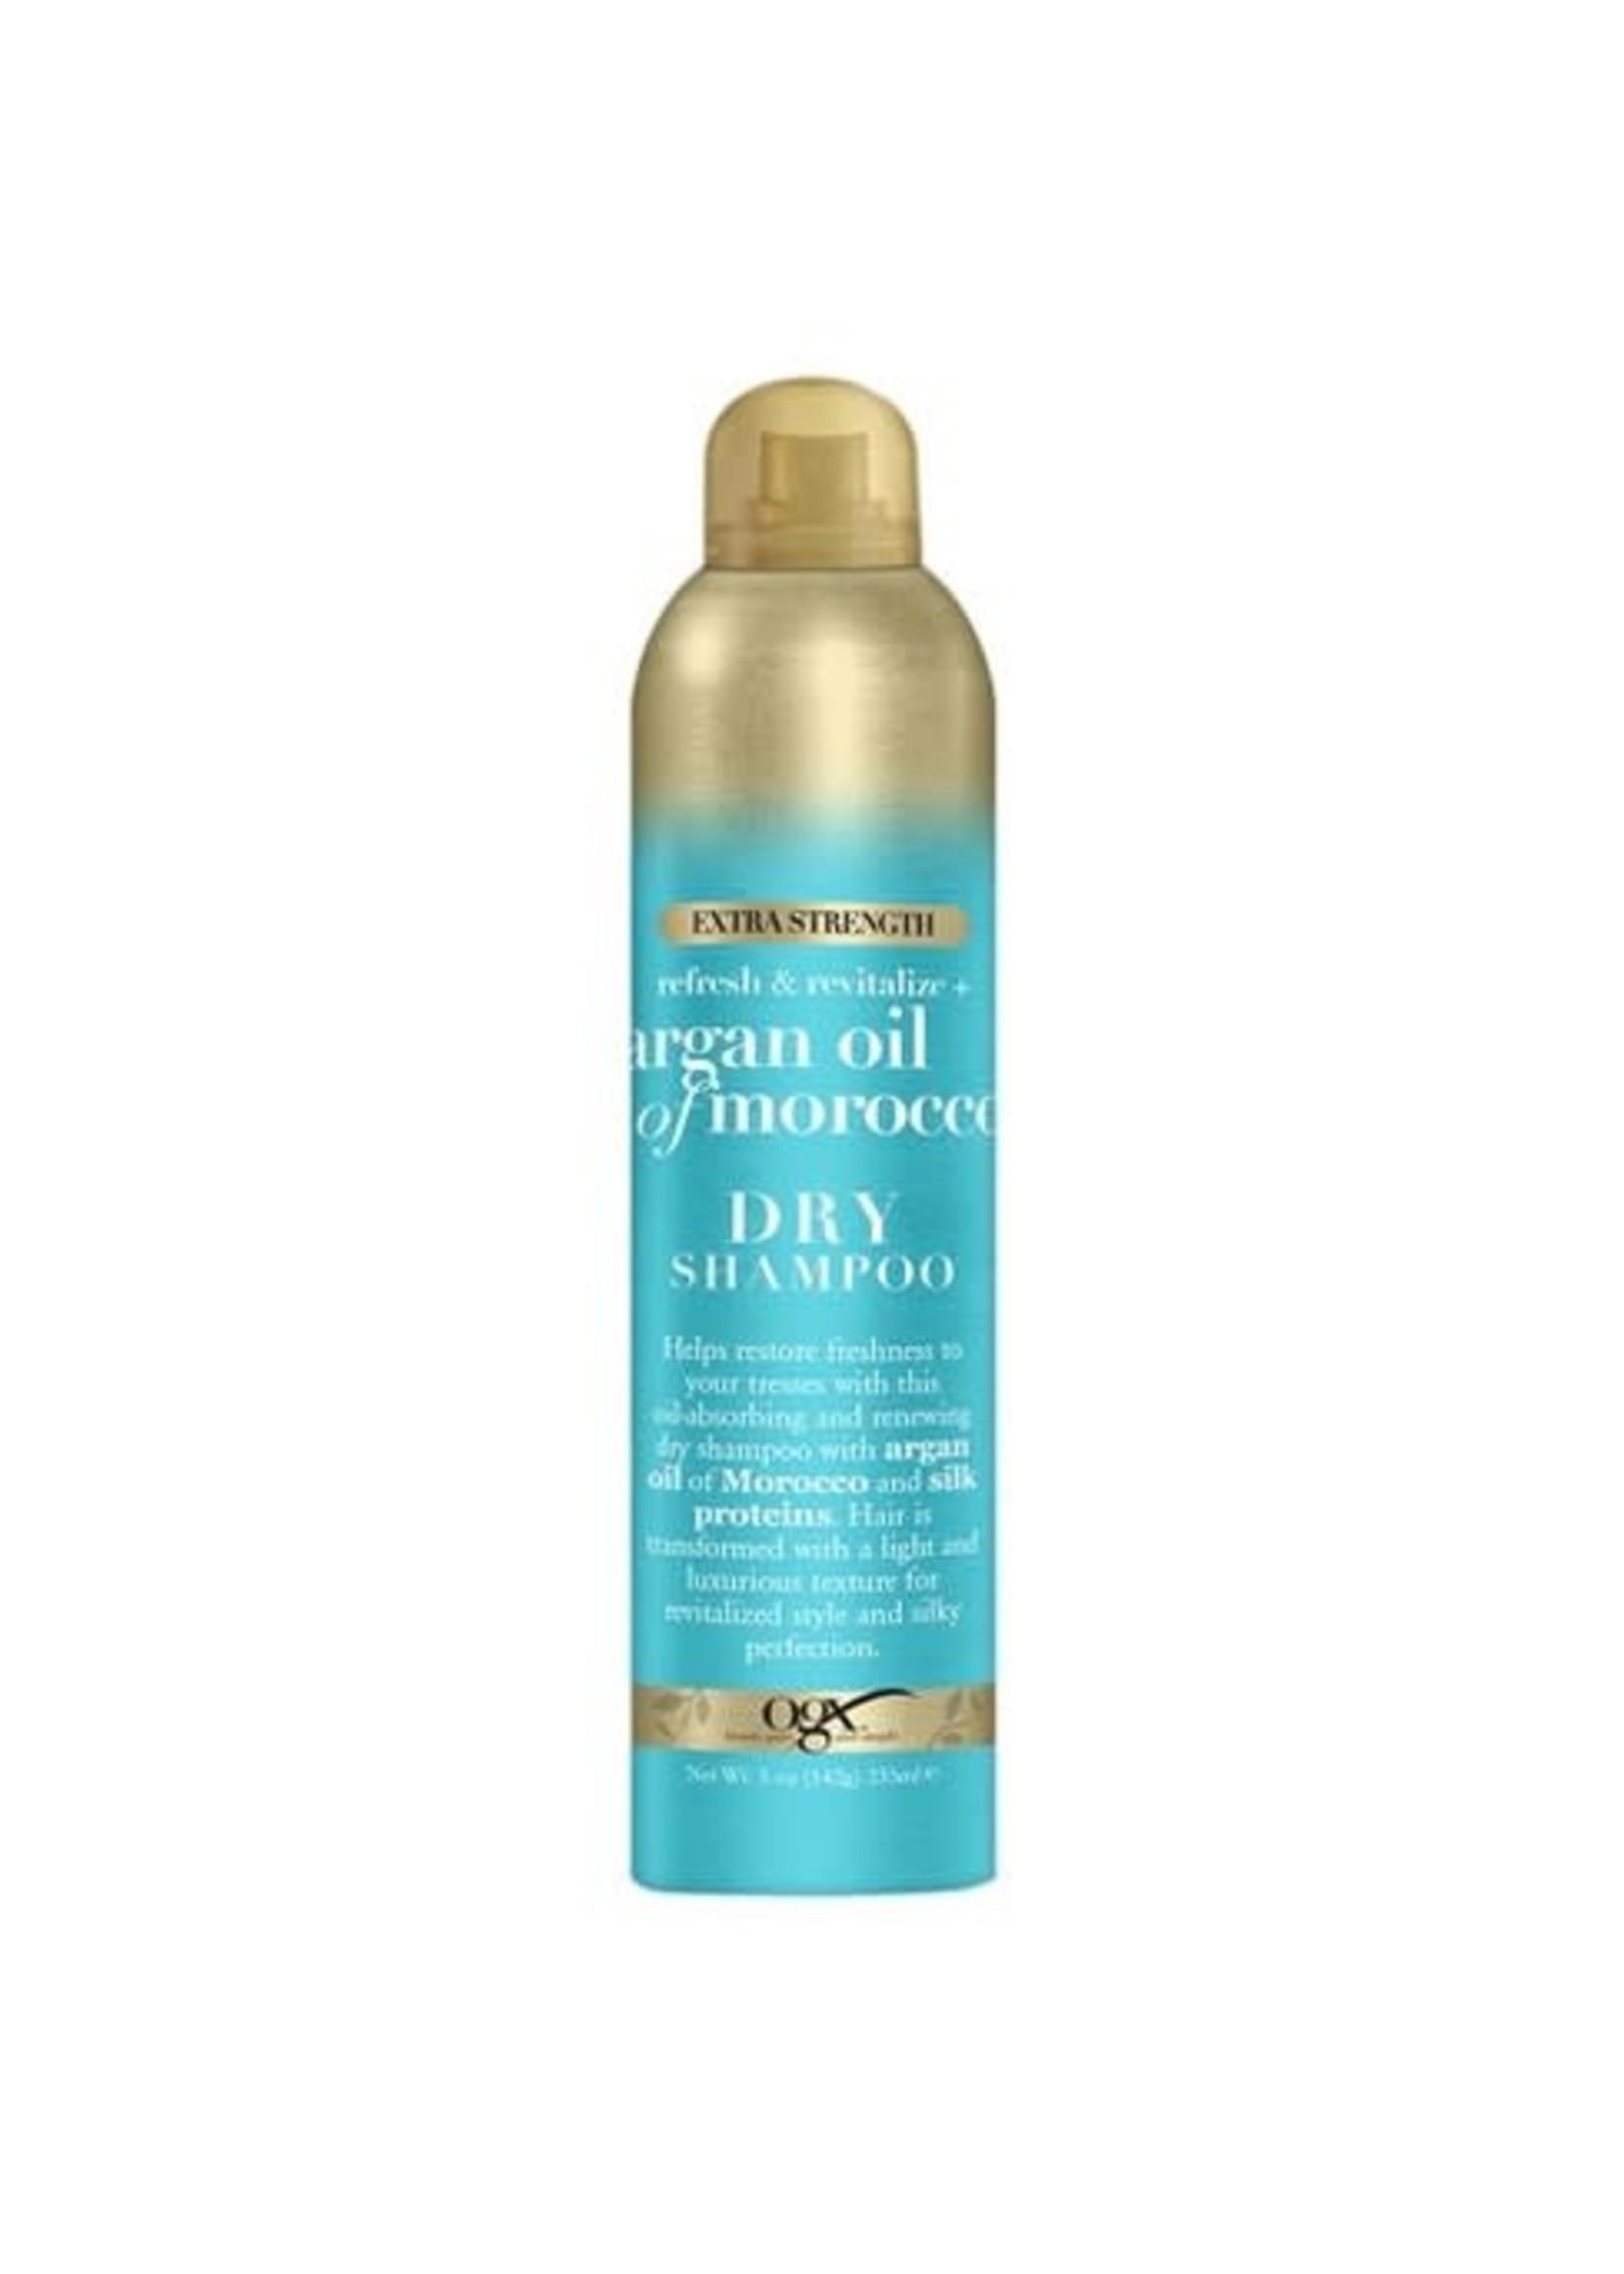 Argan Oil of Morocco Dry Shampoo